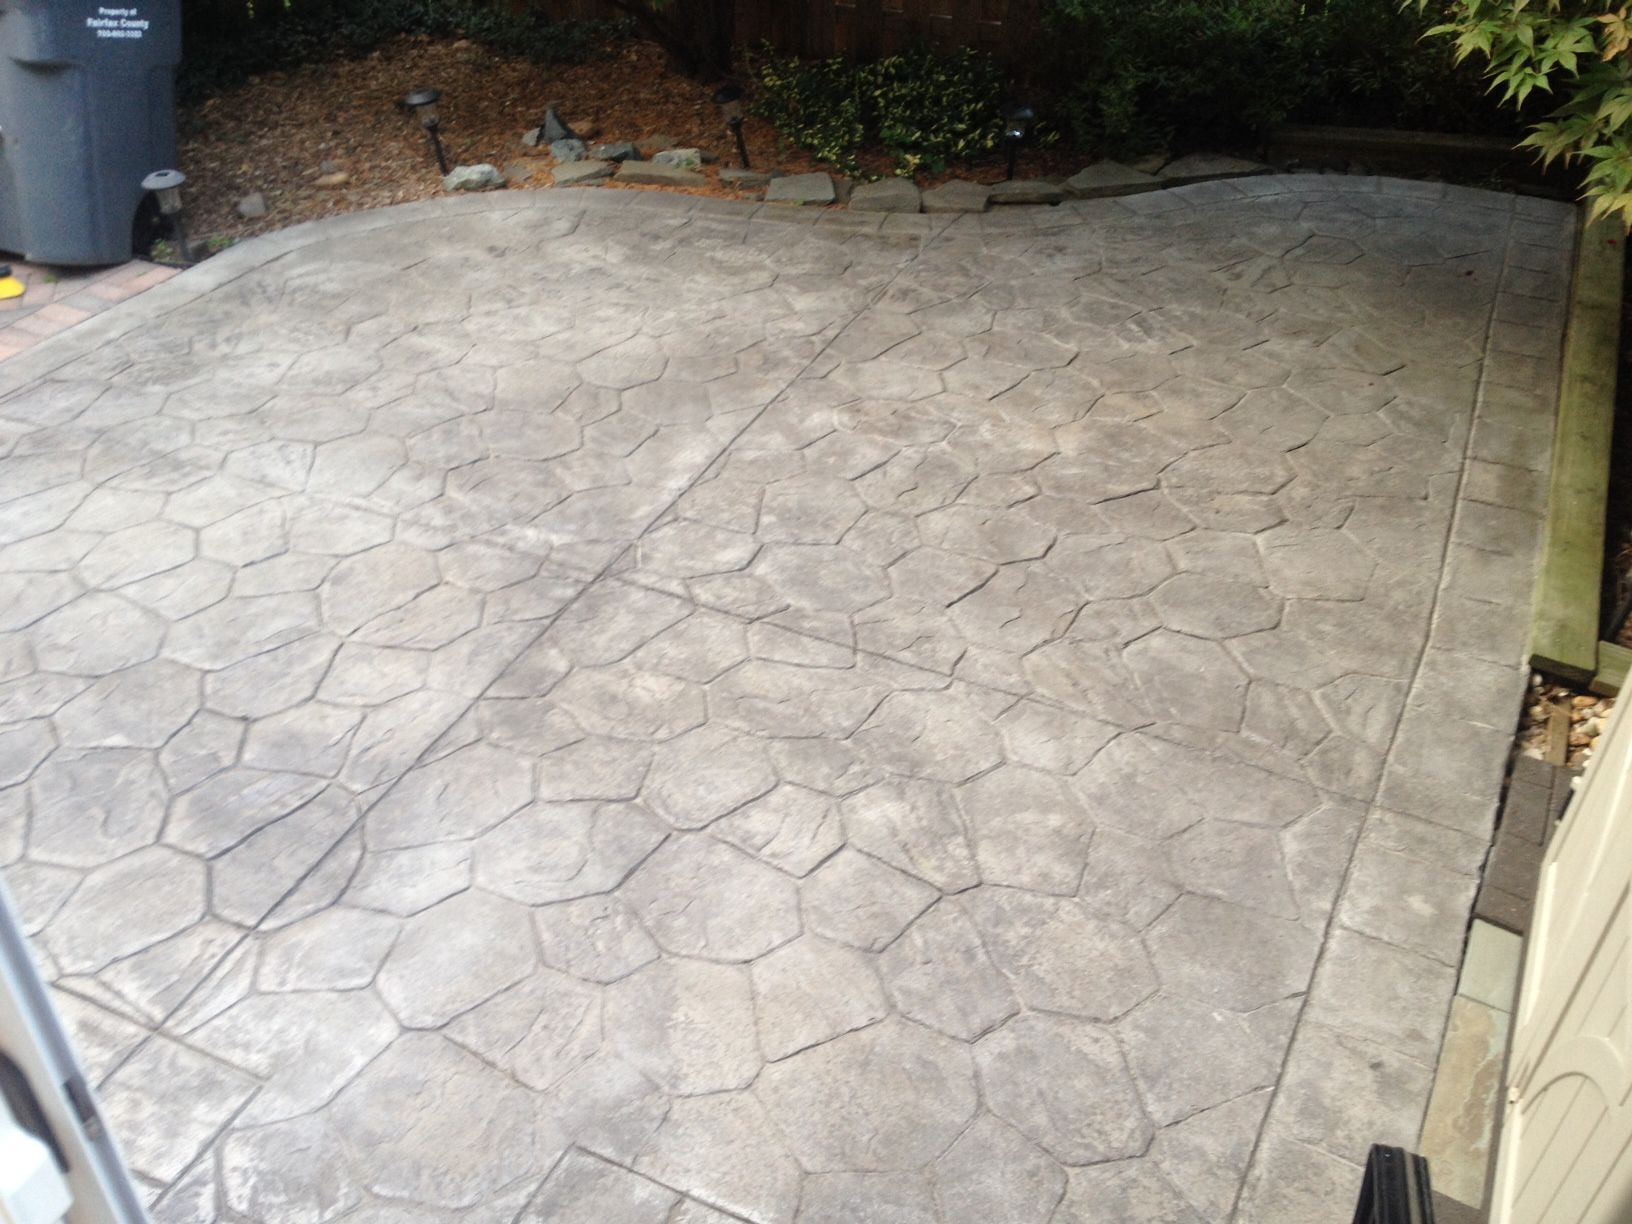 Phenomenal Customer Feedback Lastiseal Concrete Stain Sealer Interior Design Ideas Skatsoteloinfo